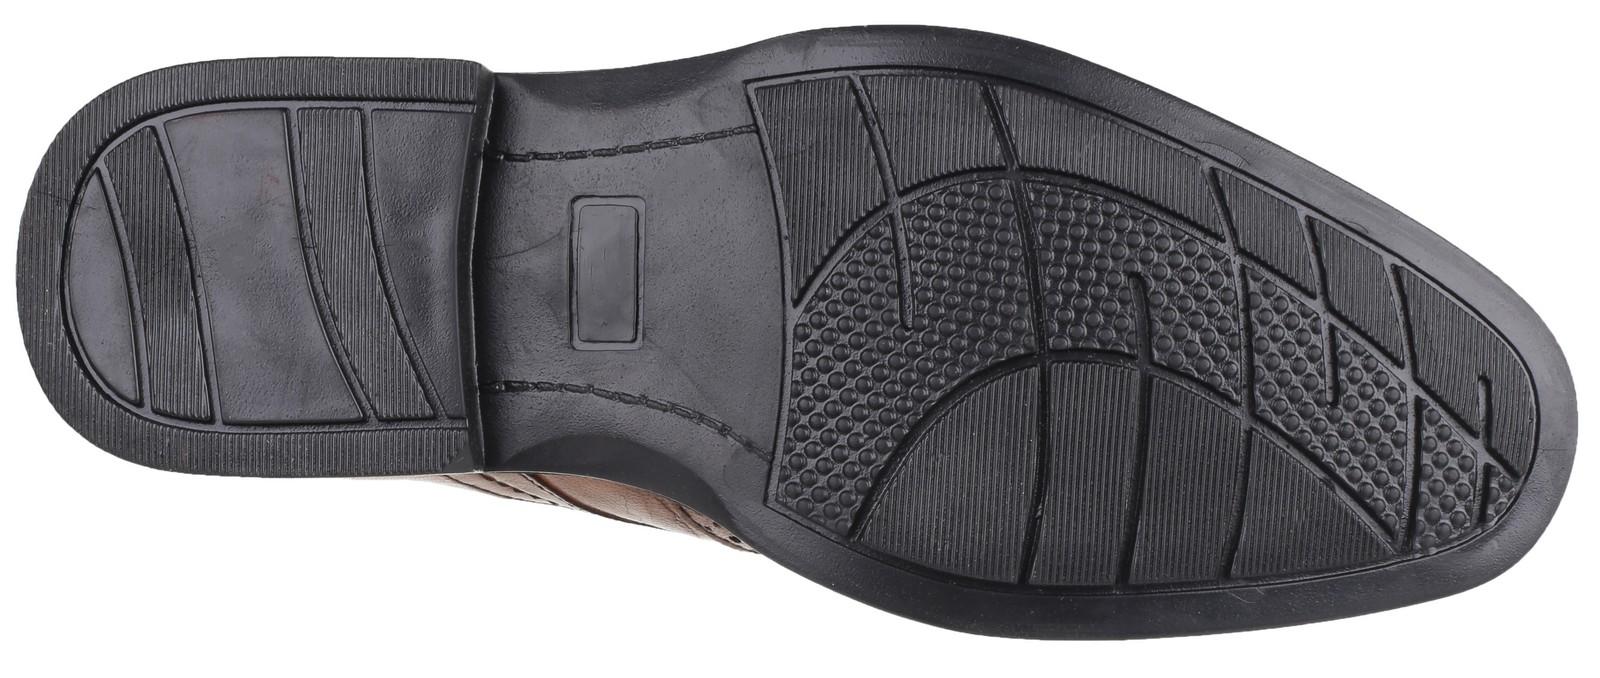 Cotswold Mickleton Scarpe Da Uomo Gibson pelle CALATA all'inglese 100% in pelle Gibson Calzature Formale 1ad3ab